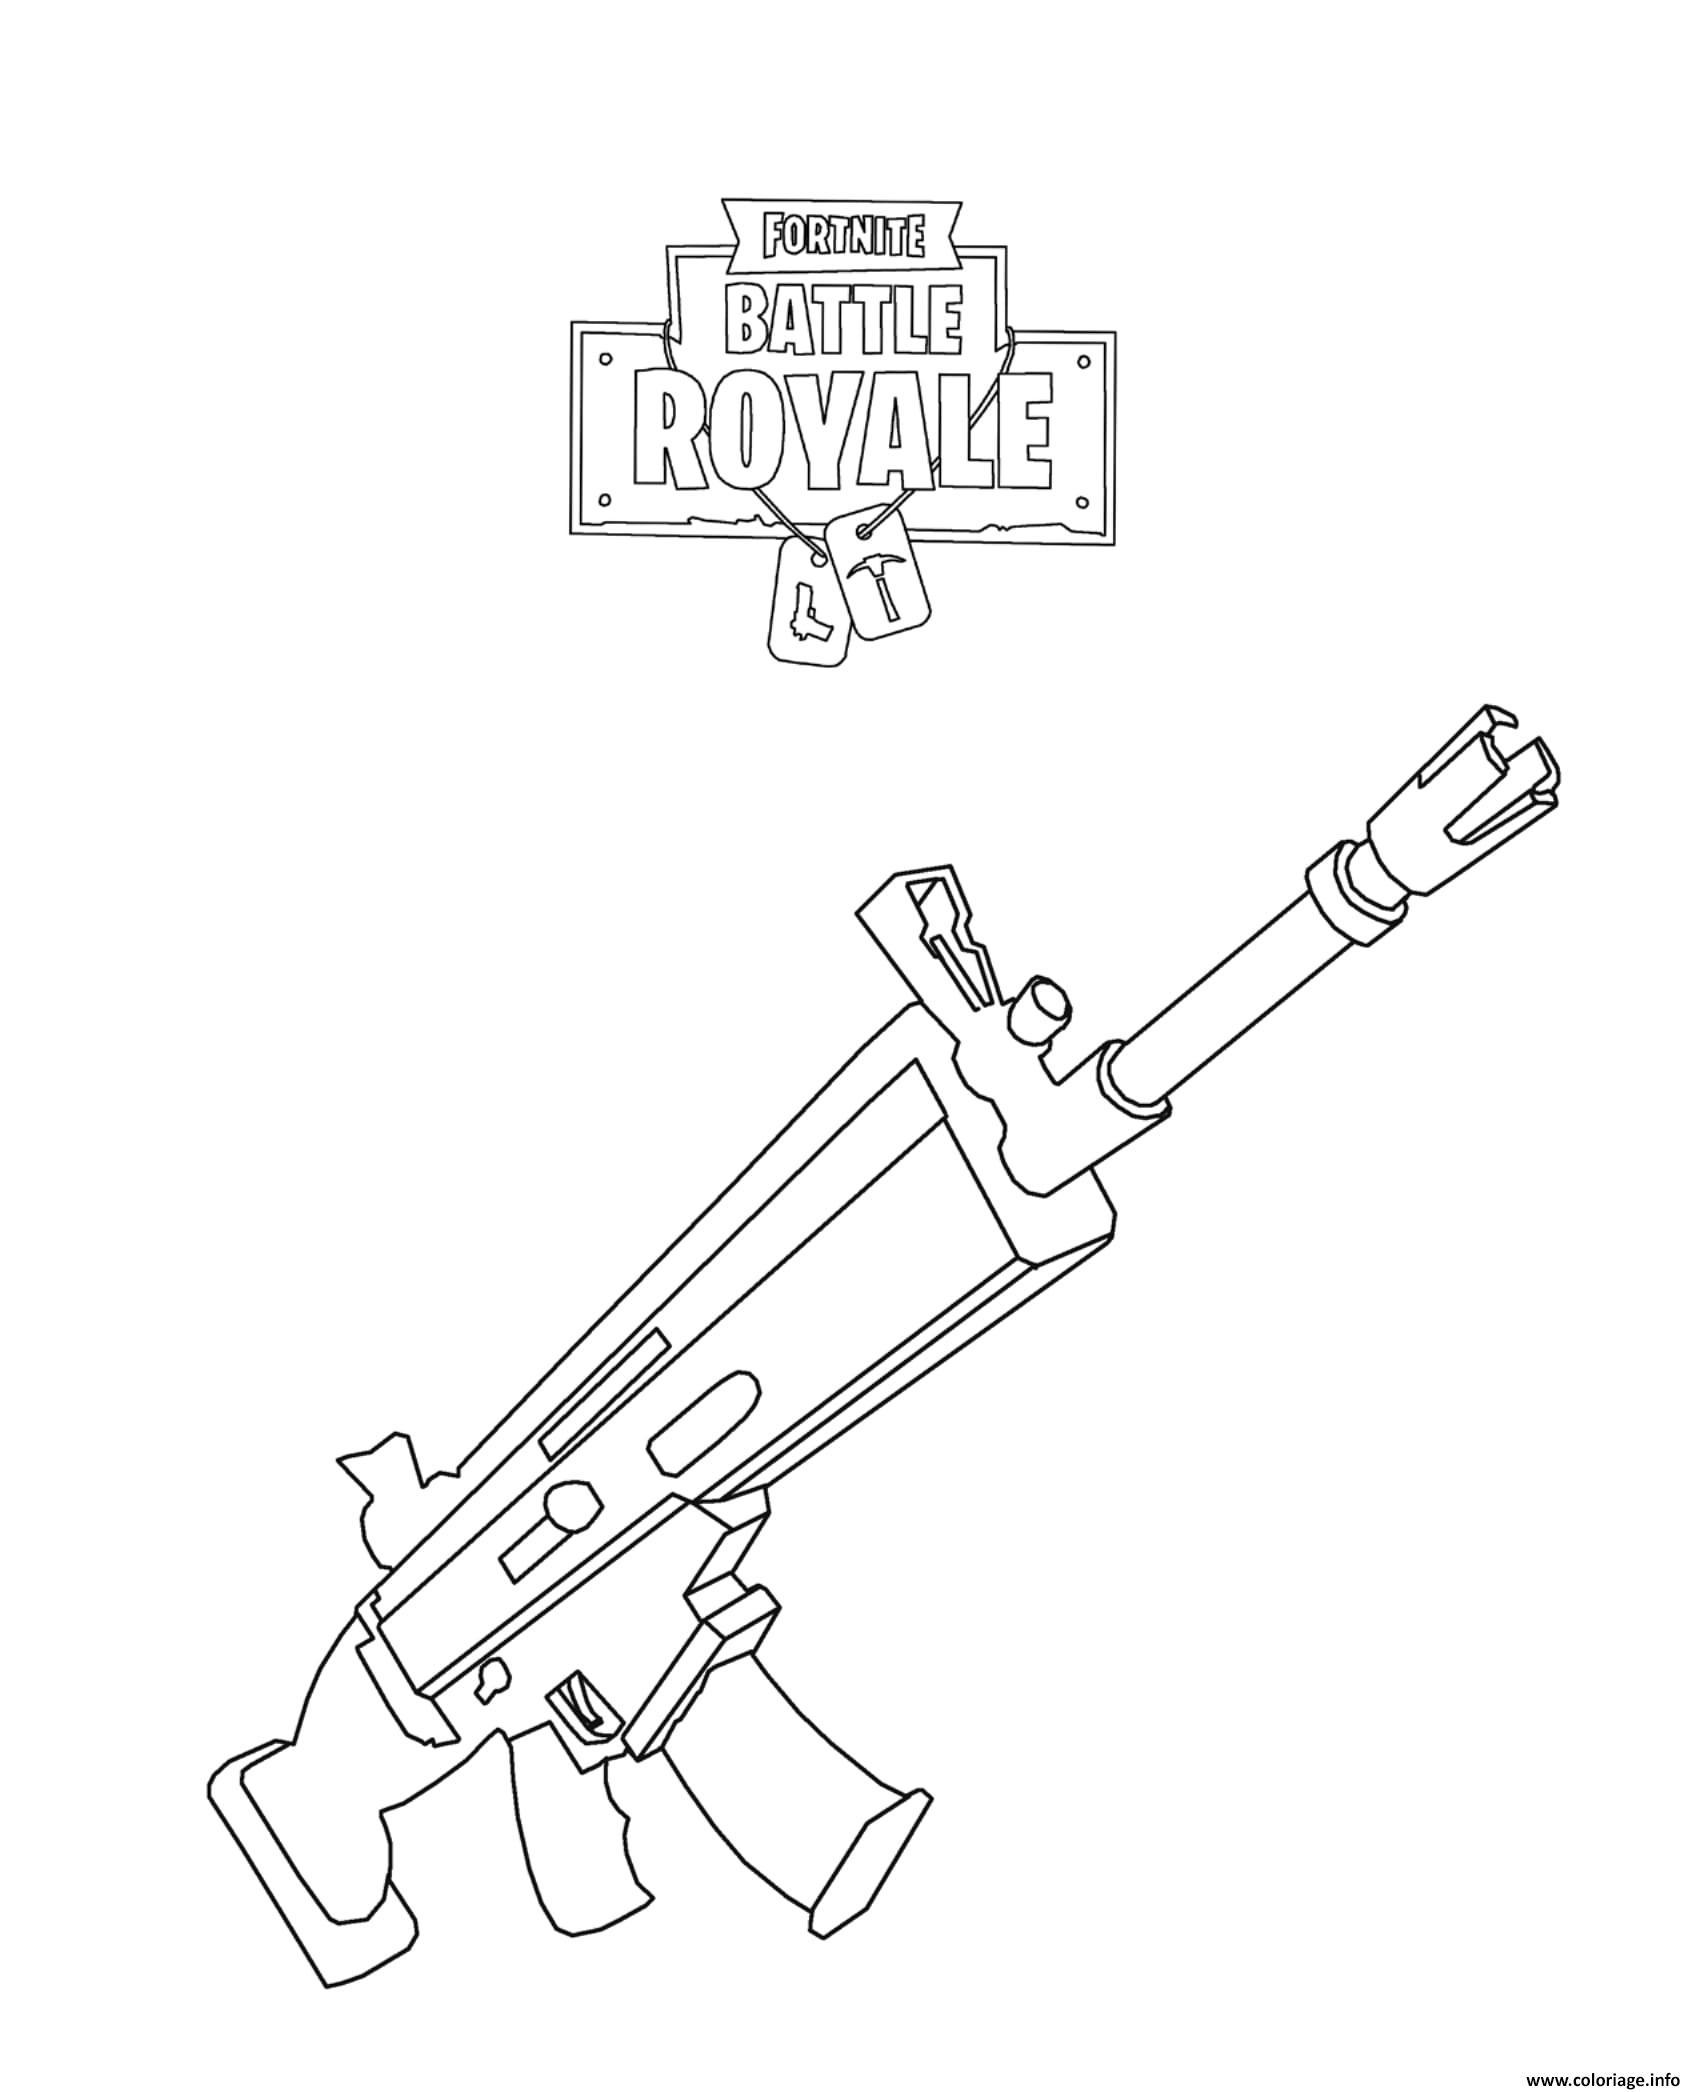 Coloriage Fortnite Drift.Coloriage Fortnite Battle Royale Scar Dessin